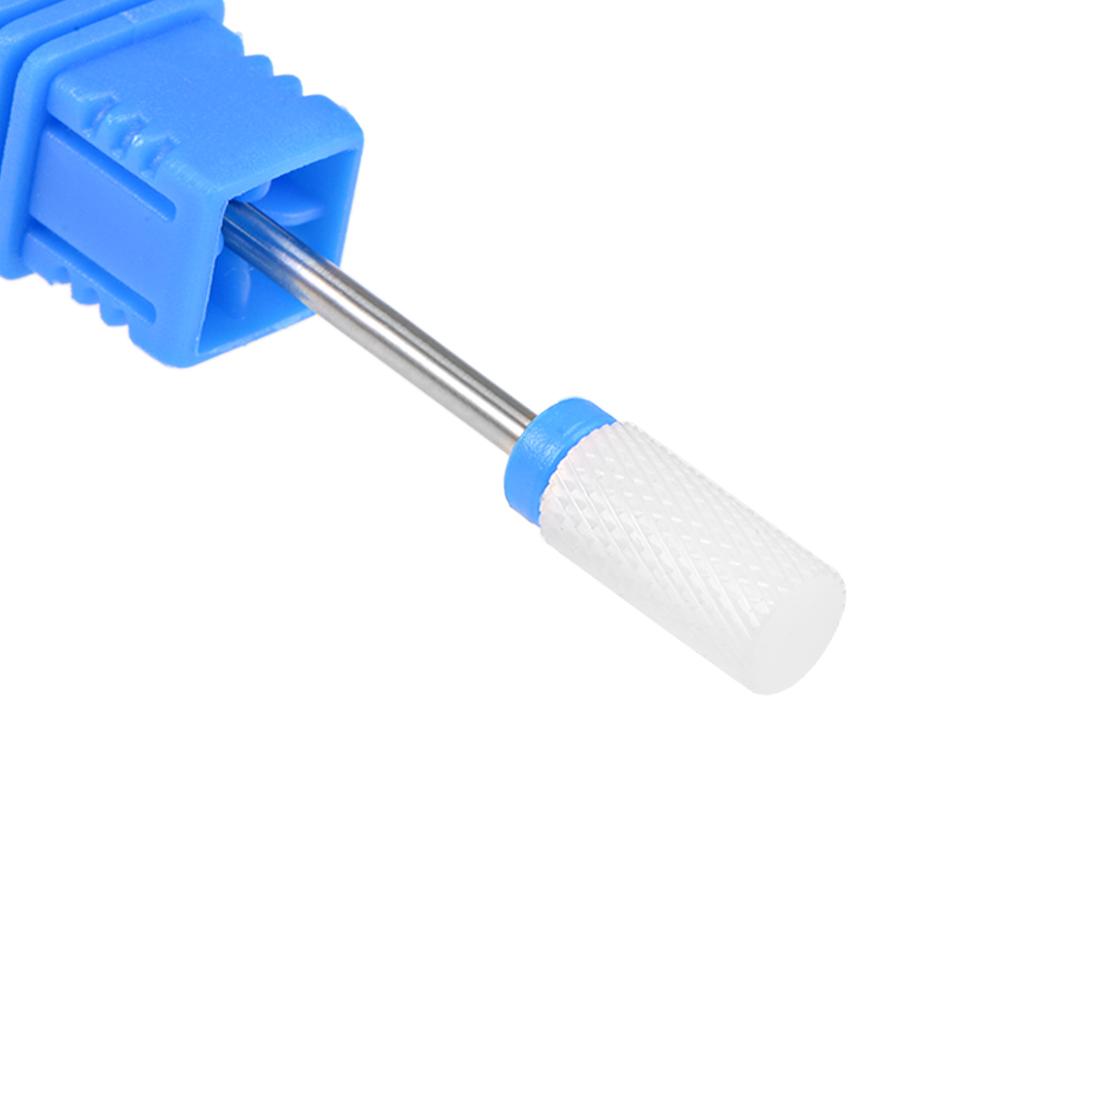 Ceramic Nail Drill Bits 3/32 inch (Medium Grit) Cuticle Gel Remove Blue